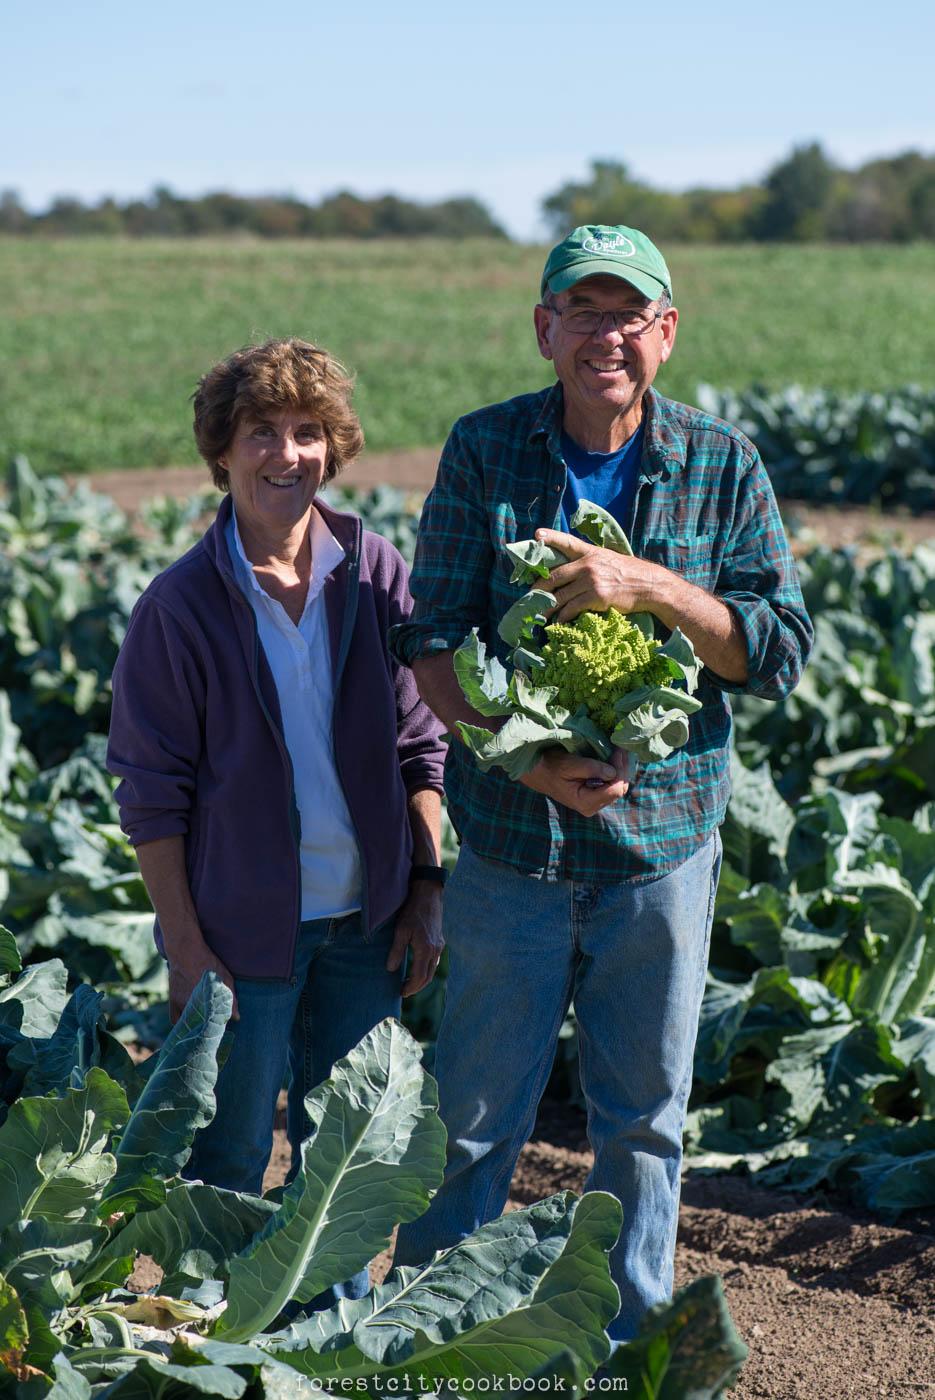 Forest City Cookbook - Applemeadow organic farm